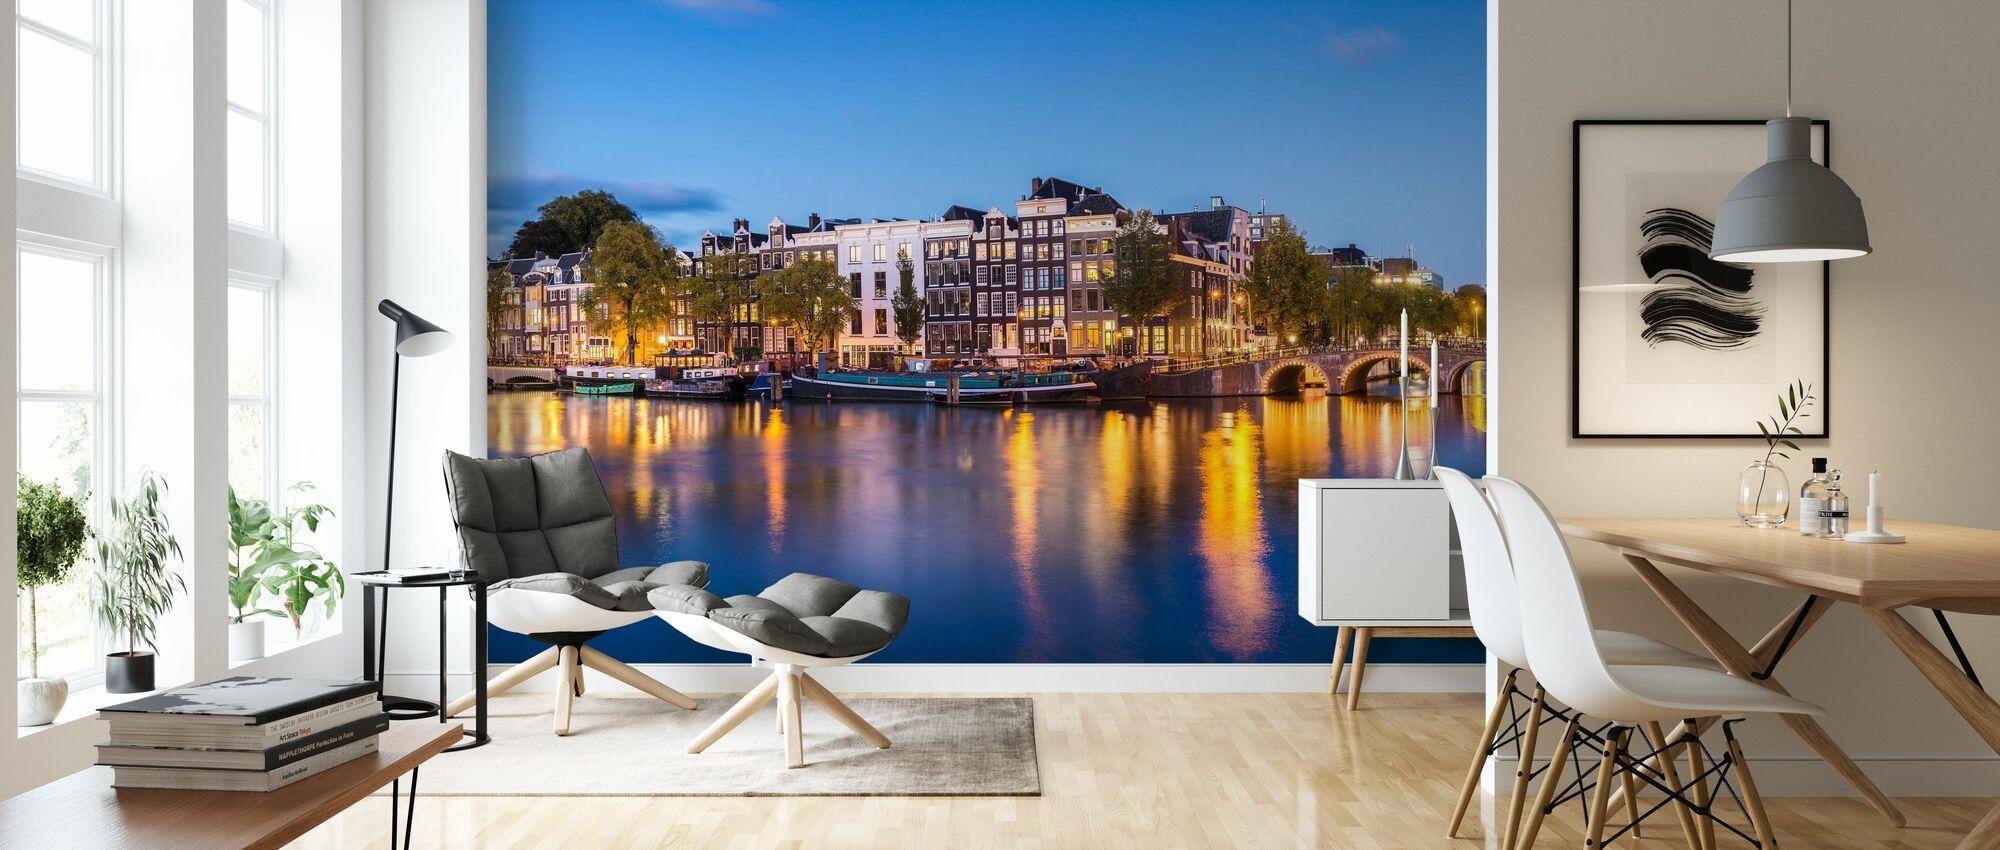 Skinny Bridge and Amstel Canal - Wallpaper - Living Room